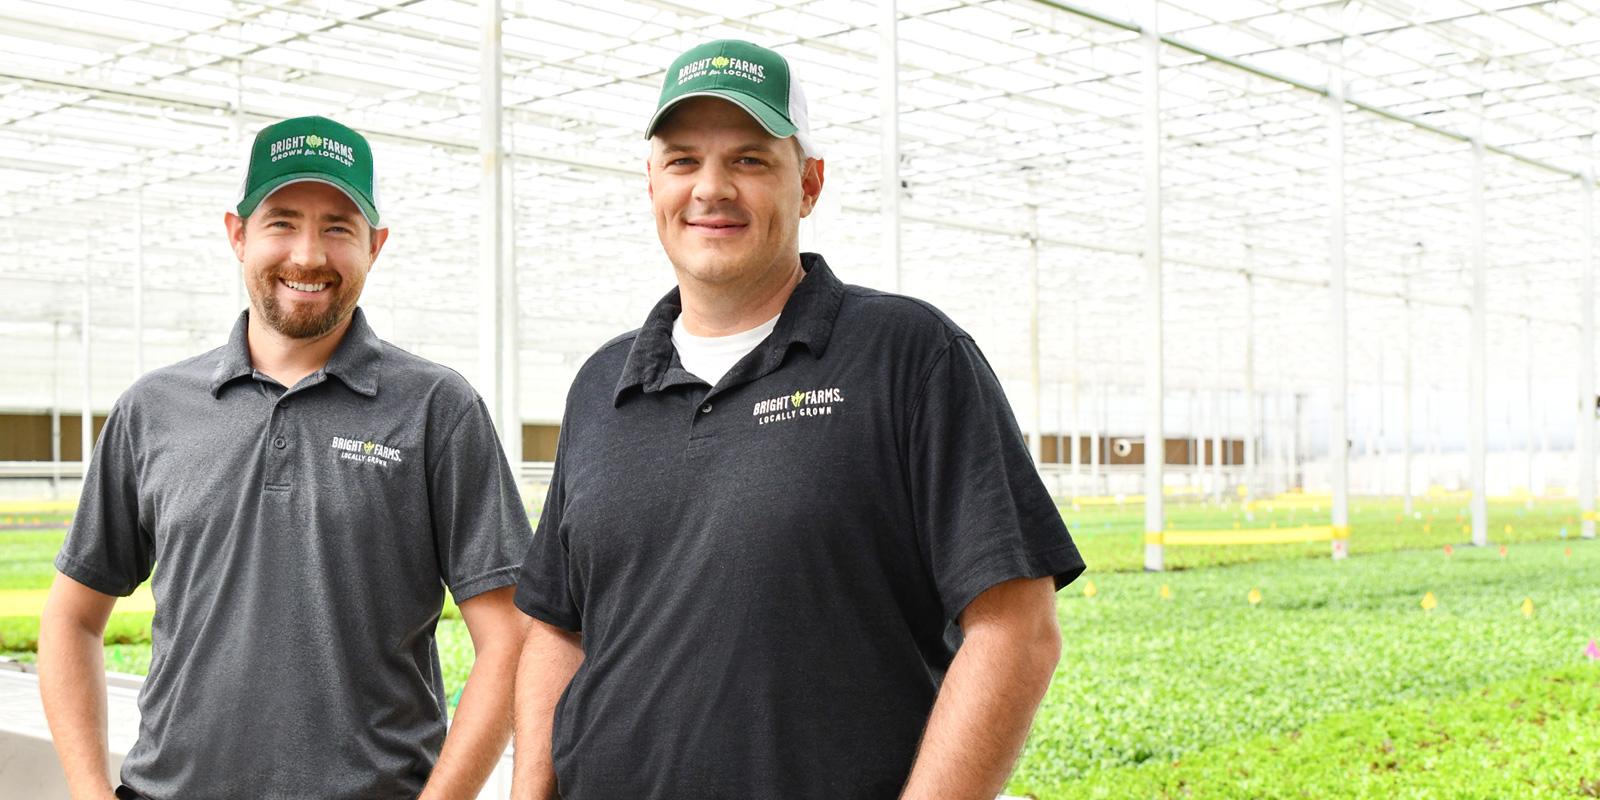 BrightFarms OHI Greenhouse | Head Grower Nick Chaney | General Manager Brian Stephens | Inside Hydroponic Farm Field